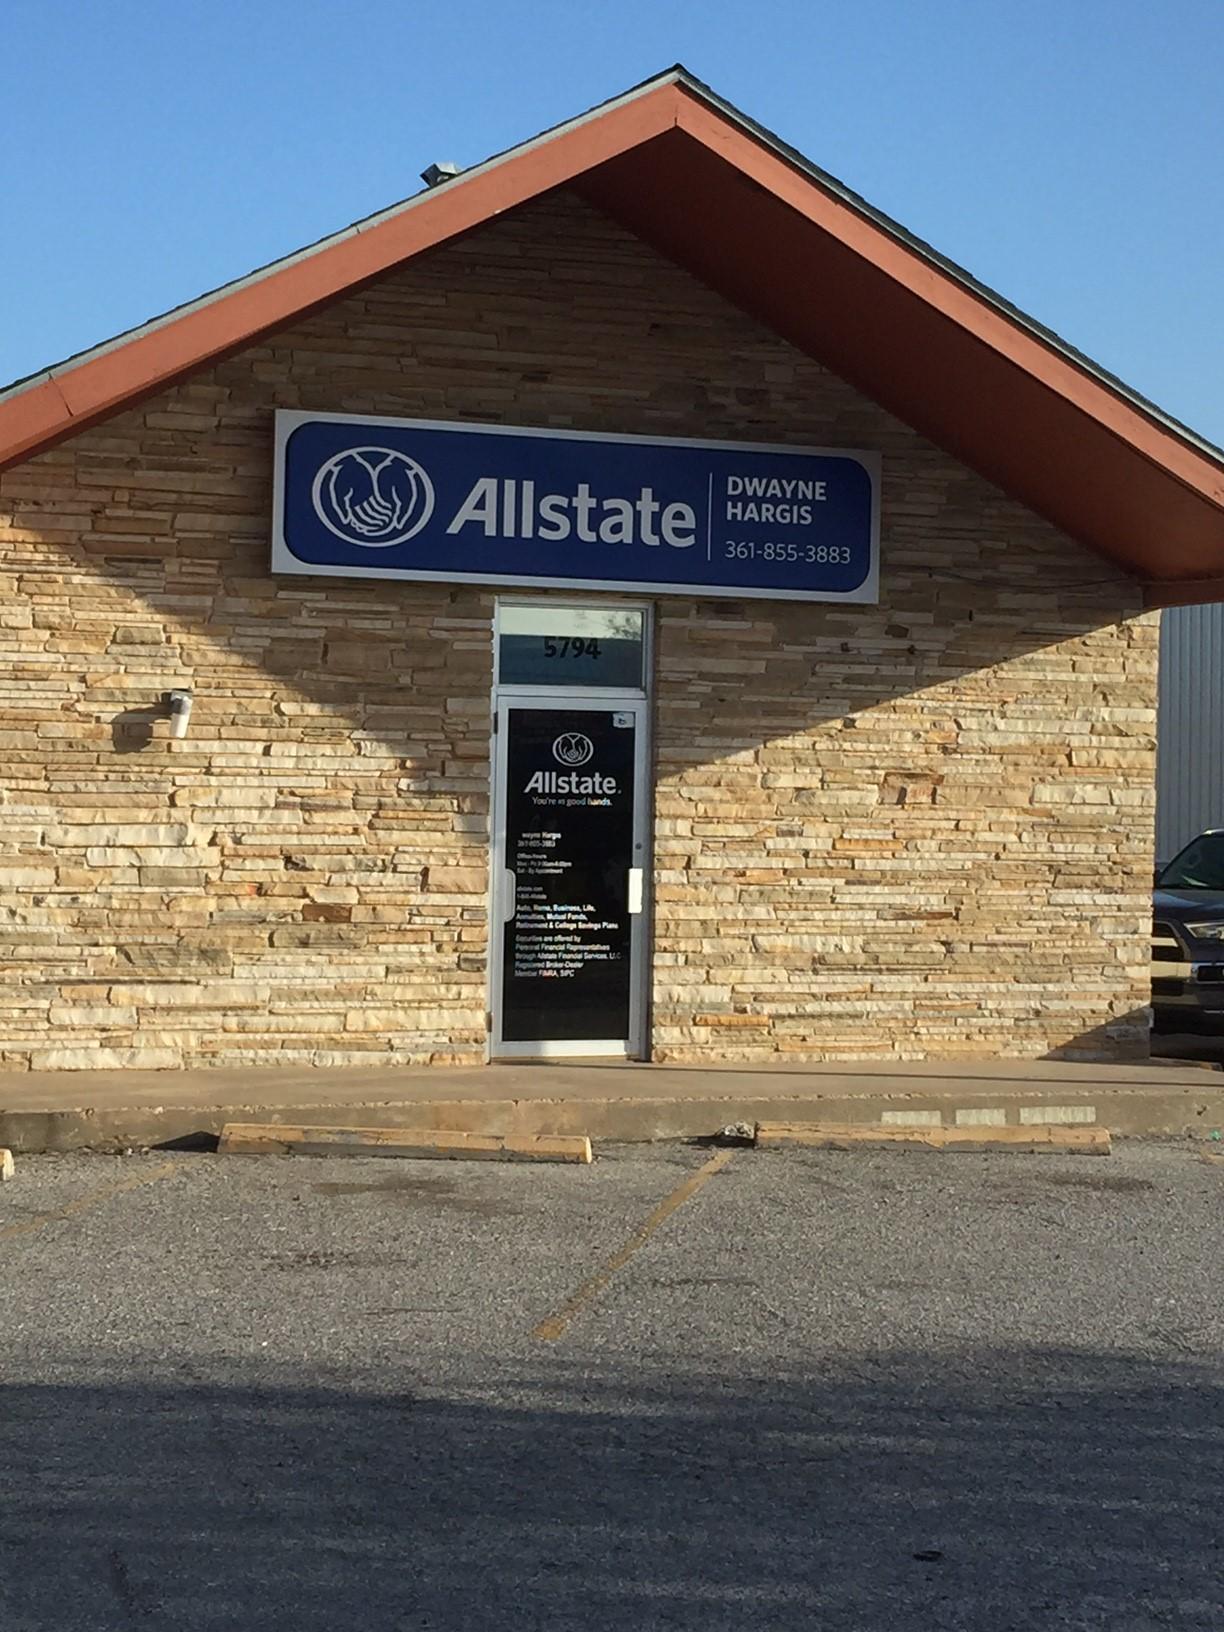 Dwayne Hargis: Allstate Insurance image 1